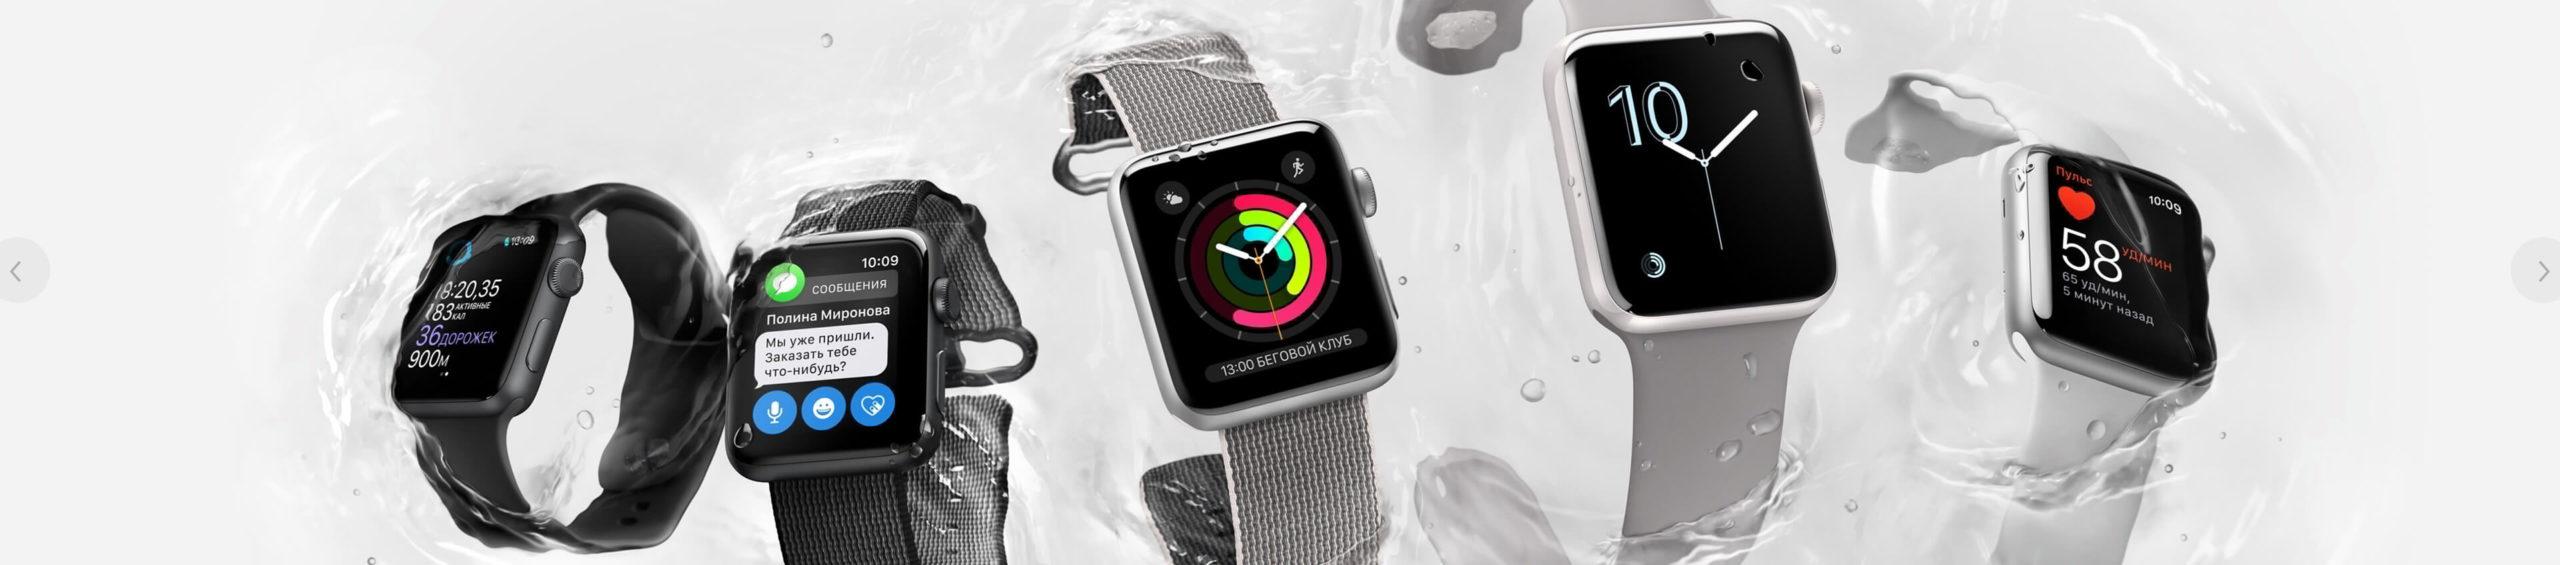 Header-Apple-Watch-Black-Friday